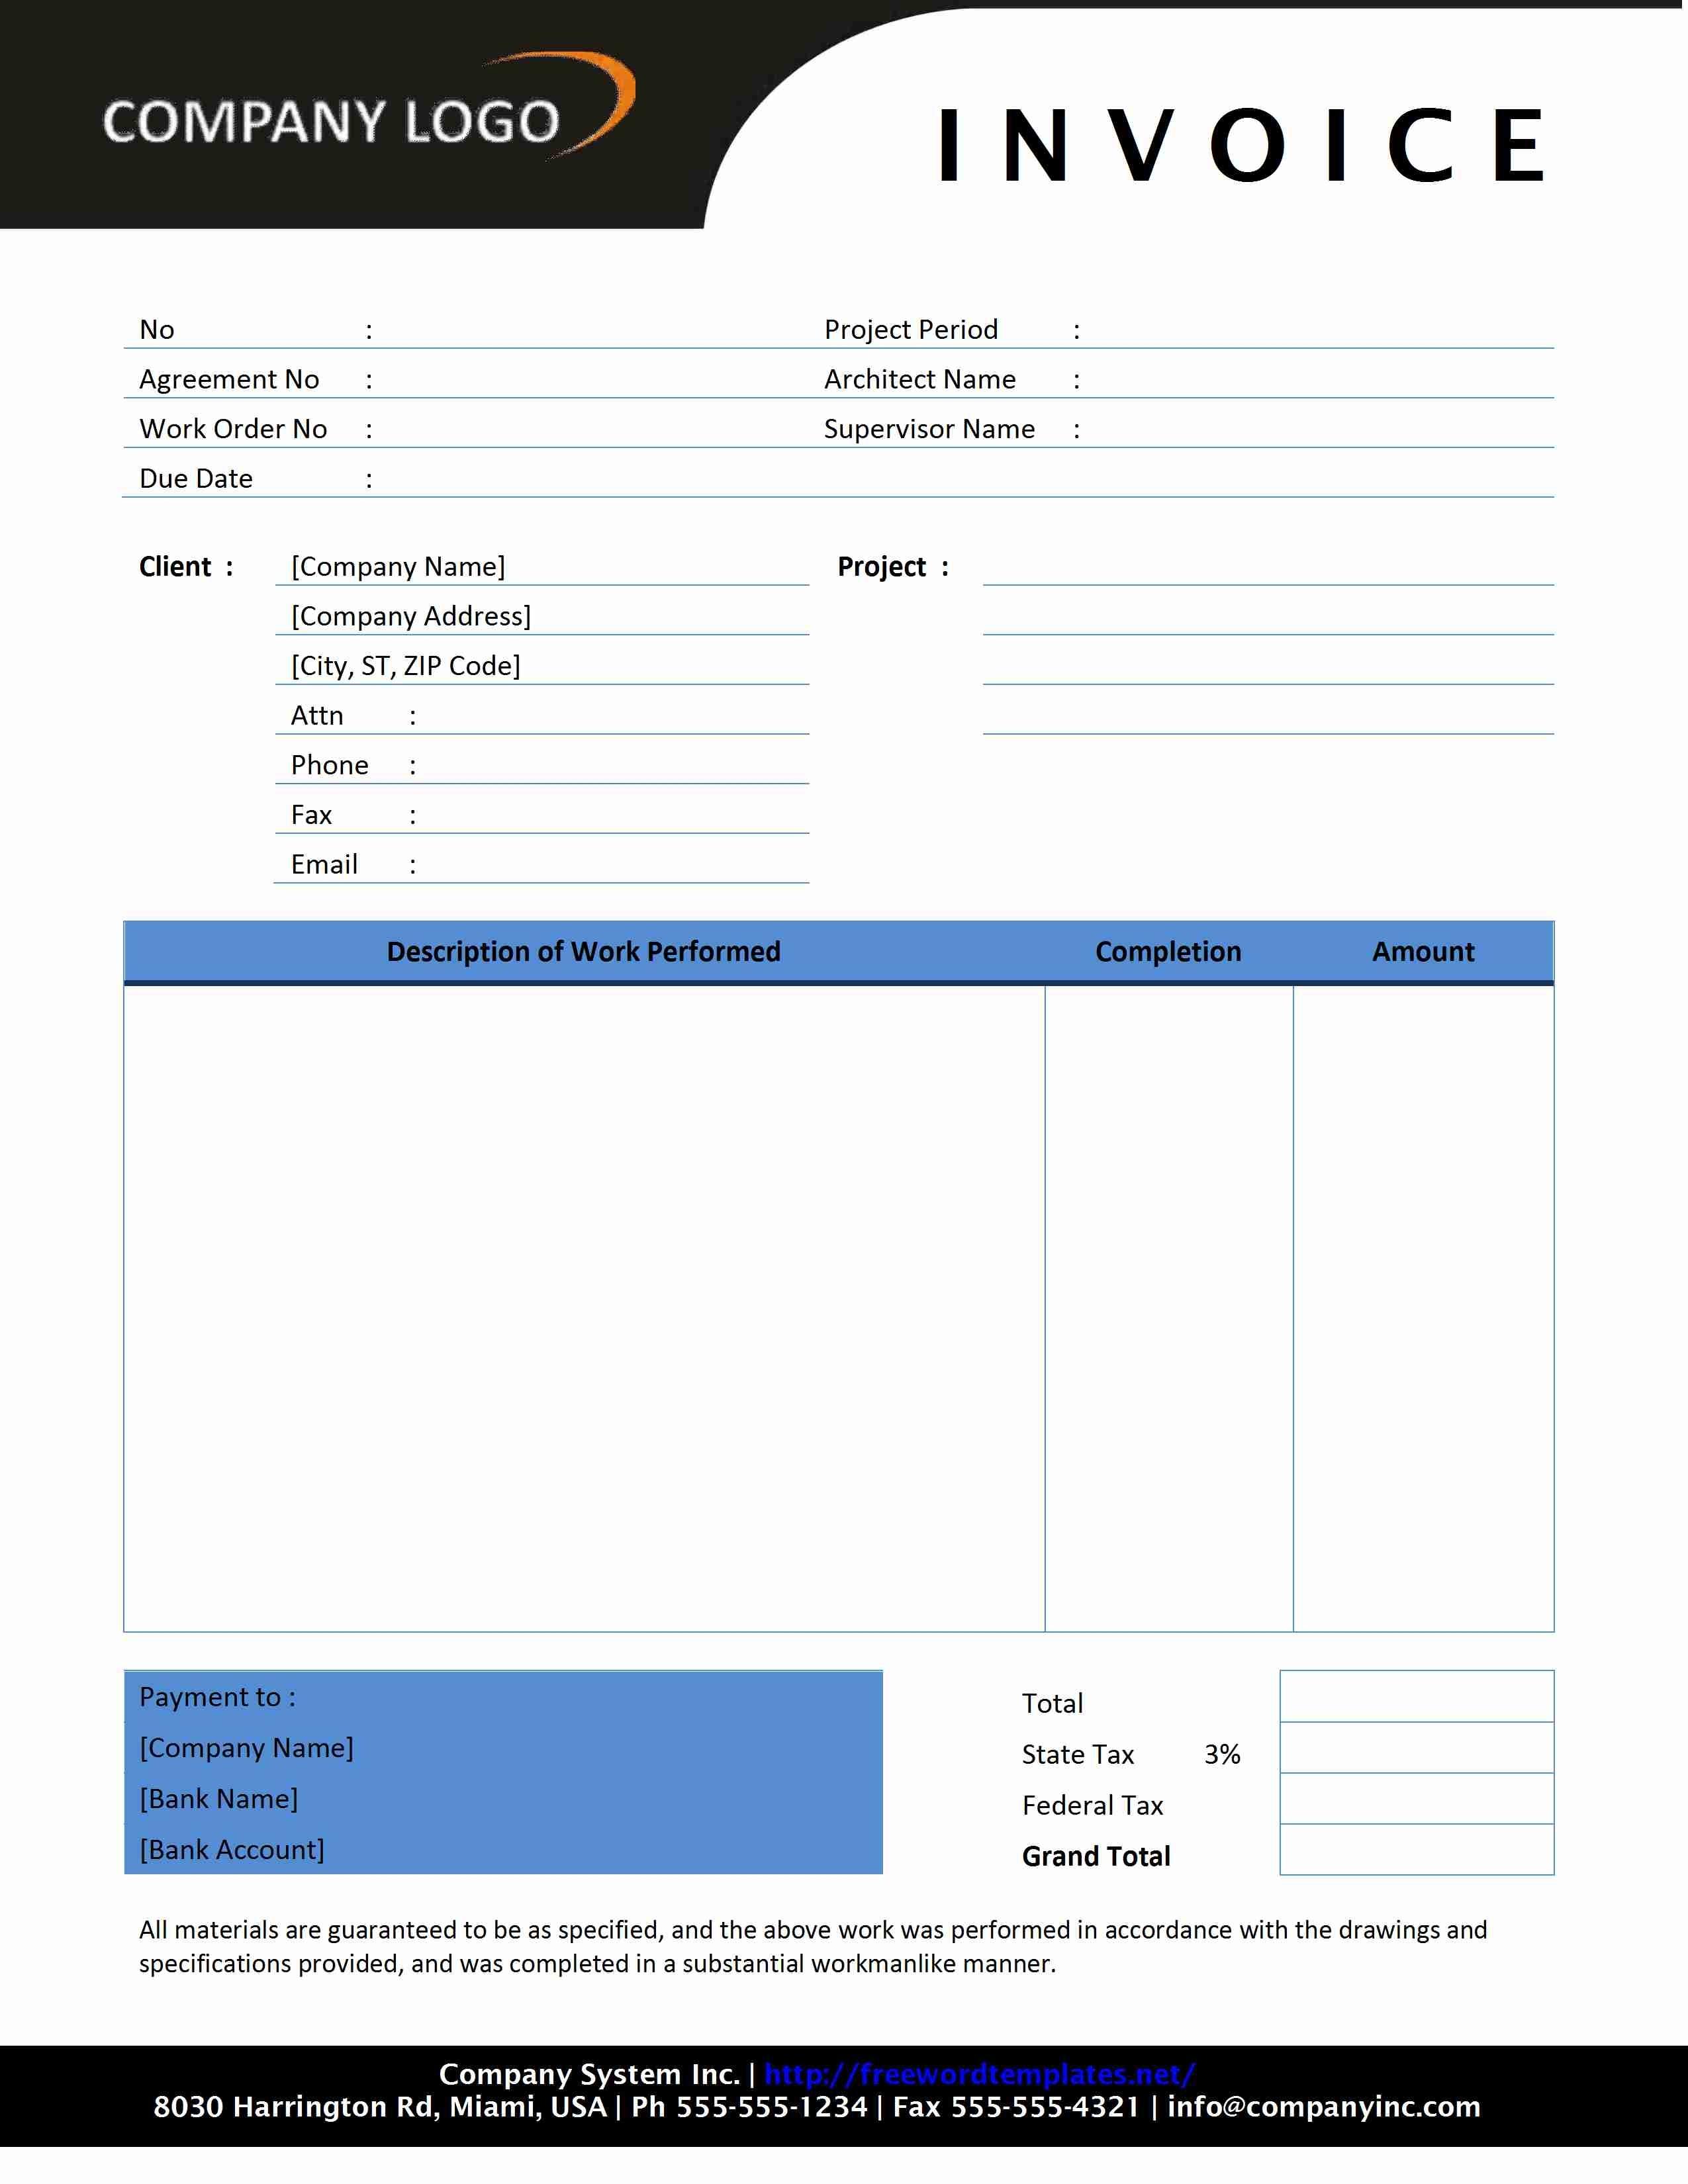 google docs templates invoice invoice template free 2016 free google invoice template